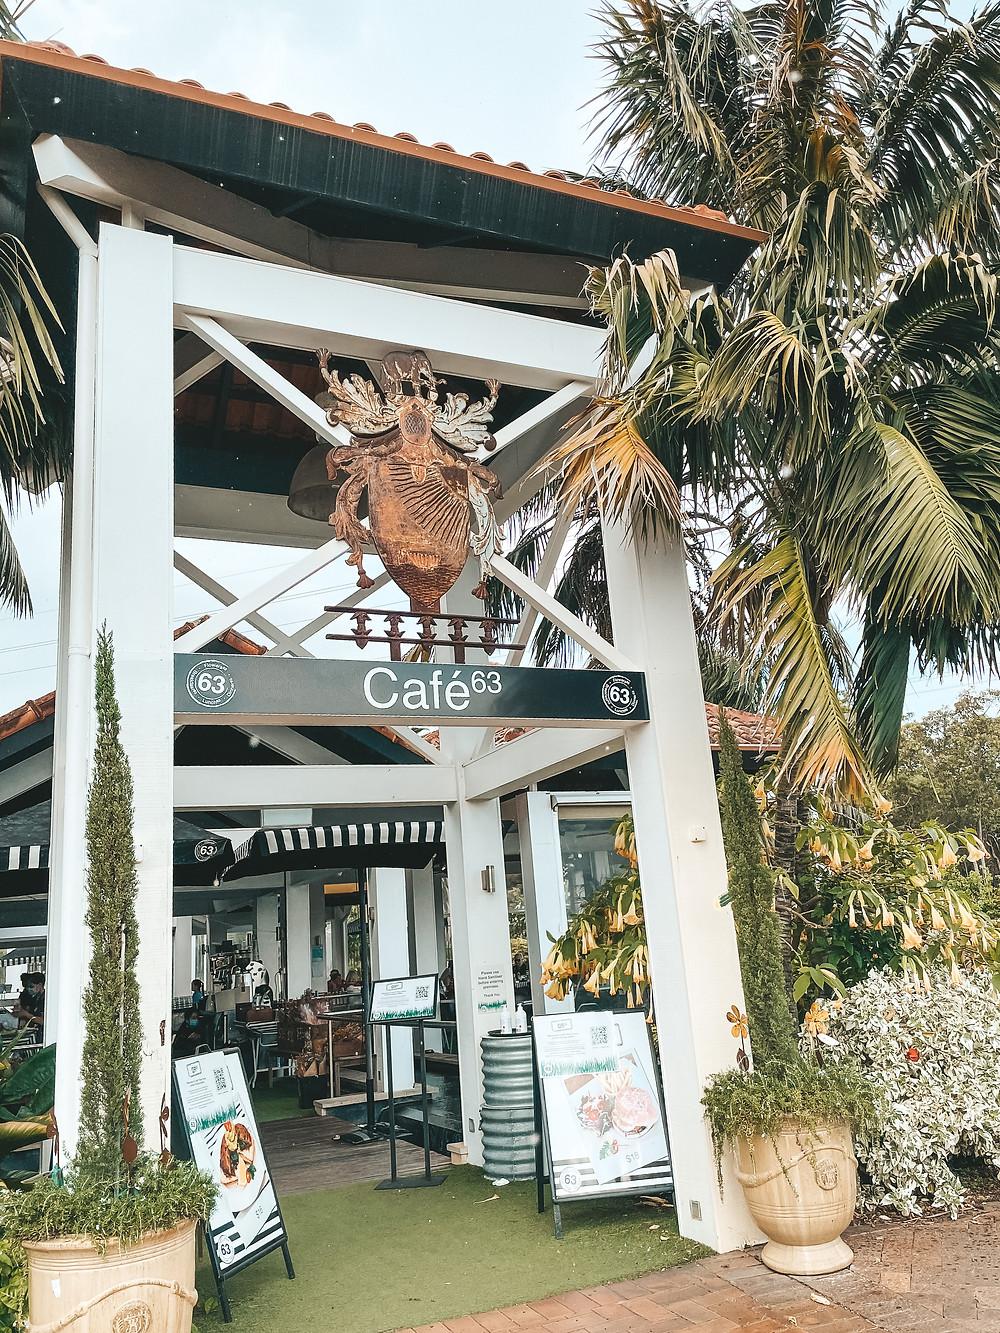 Cafe 63 in Ross Evans Garden Centre Coombabah, Gold Coast